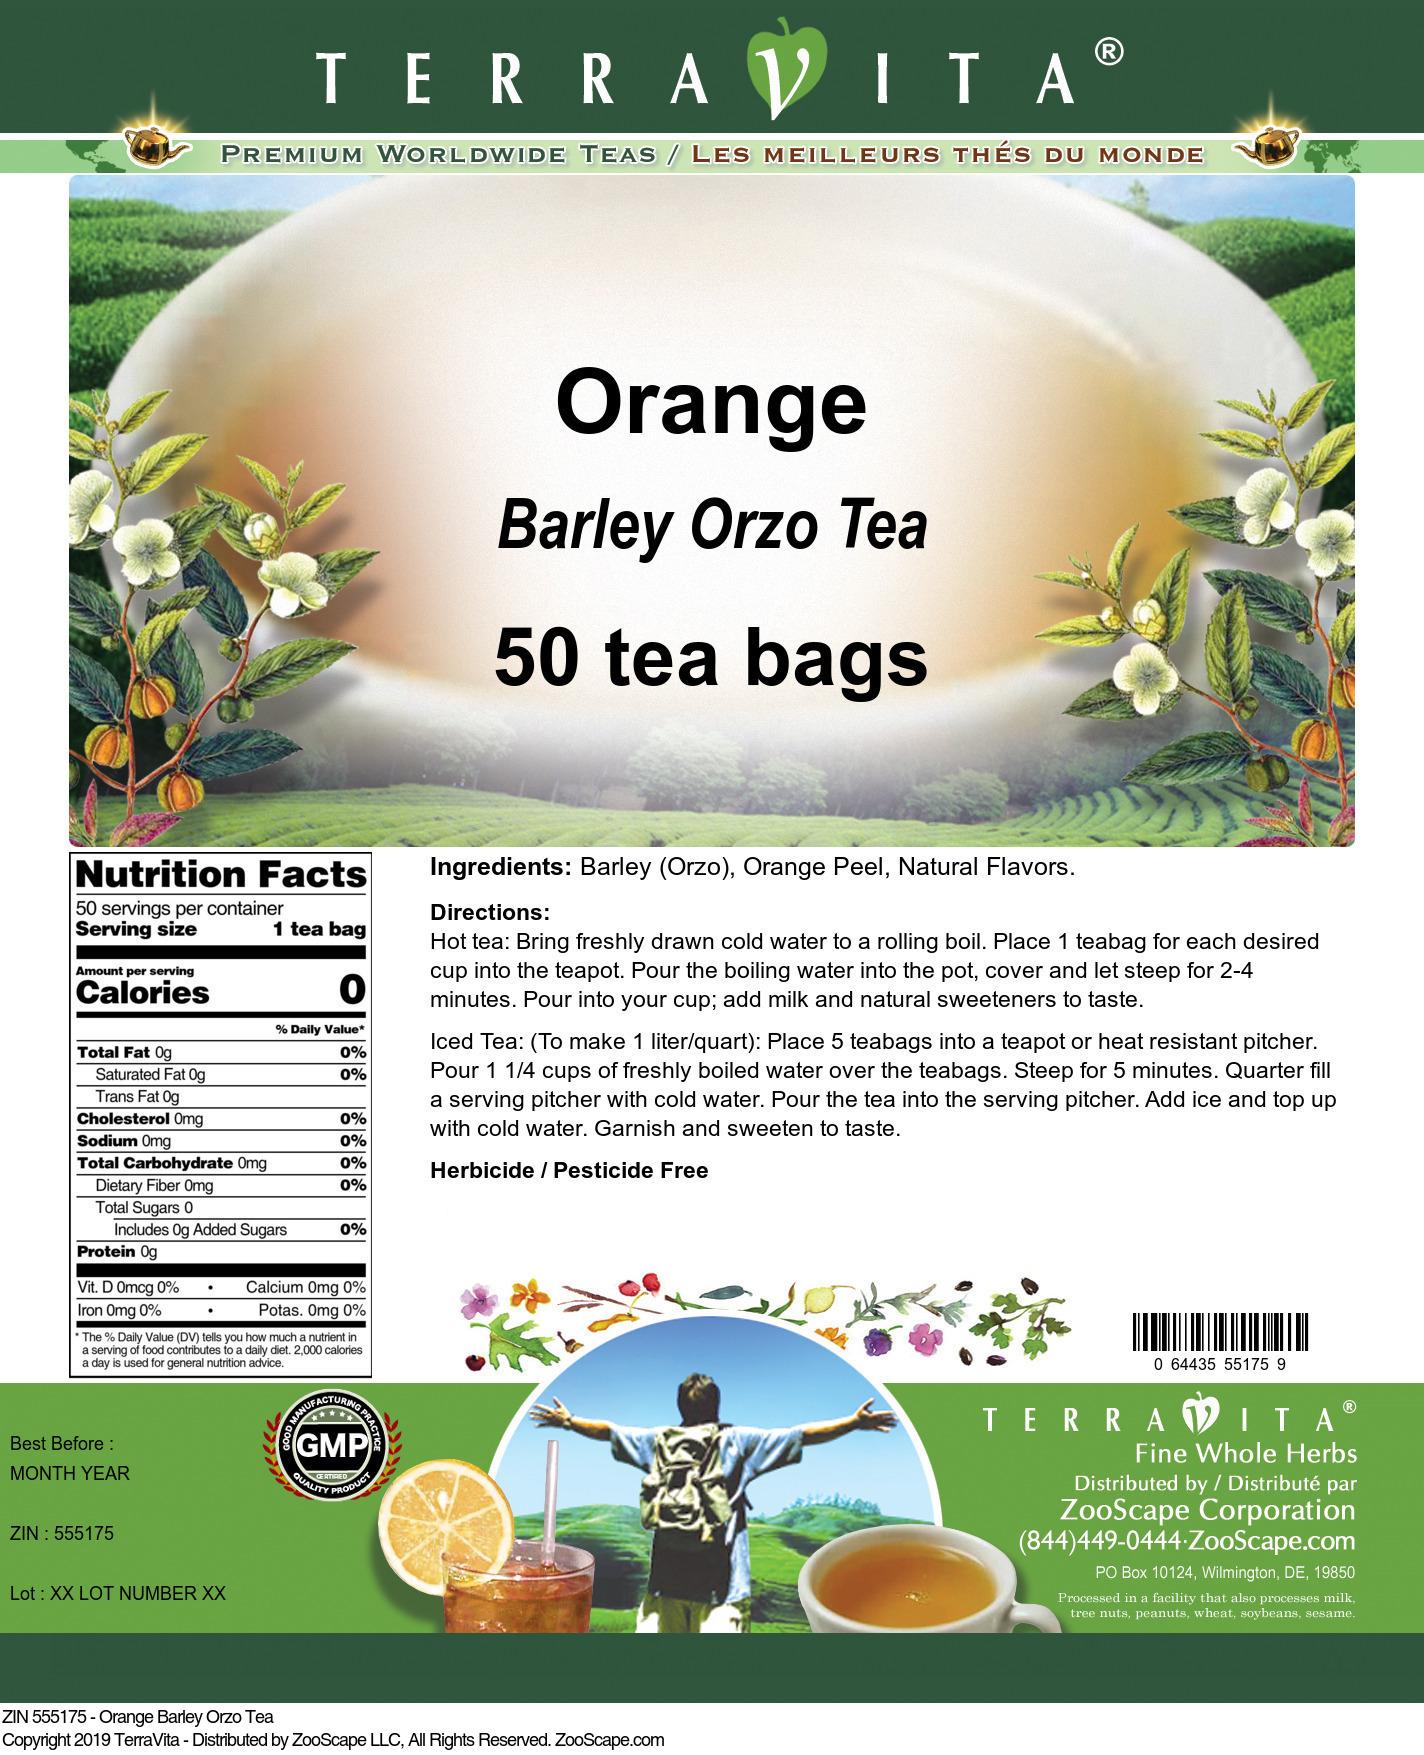 Orange Barley Orzo Tea